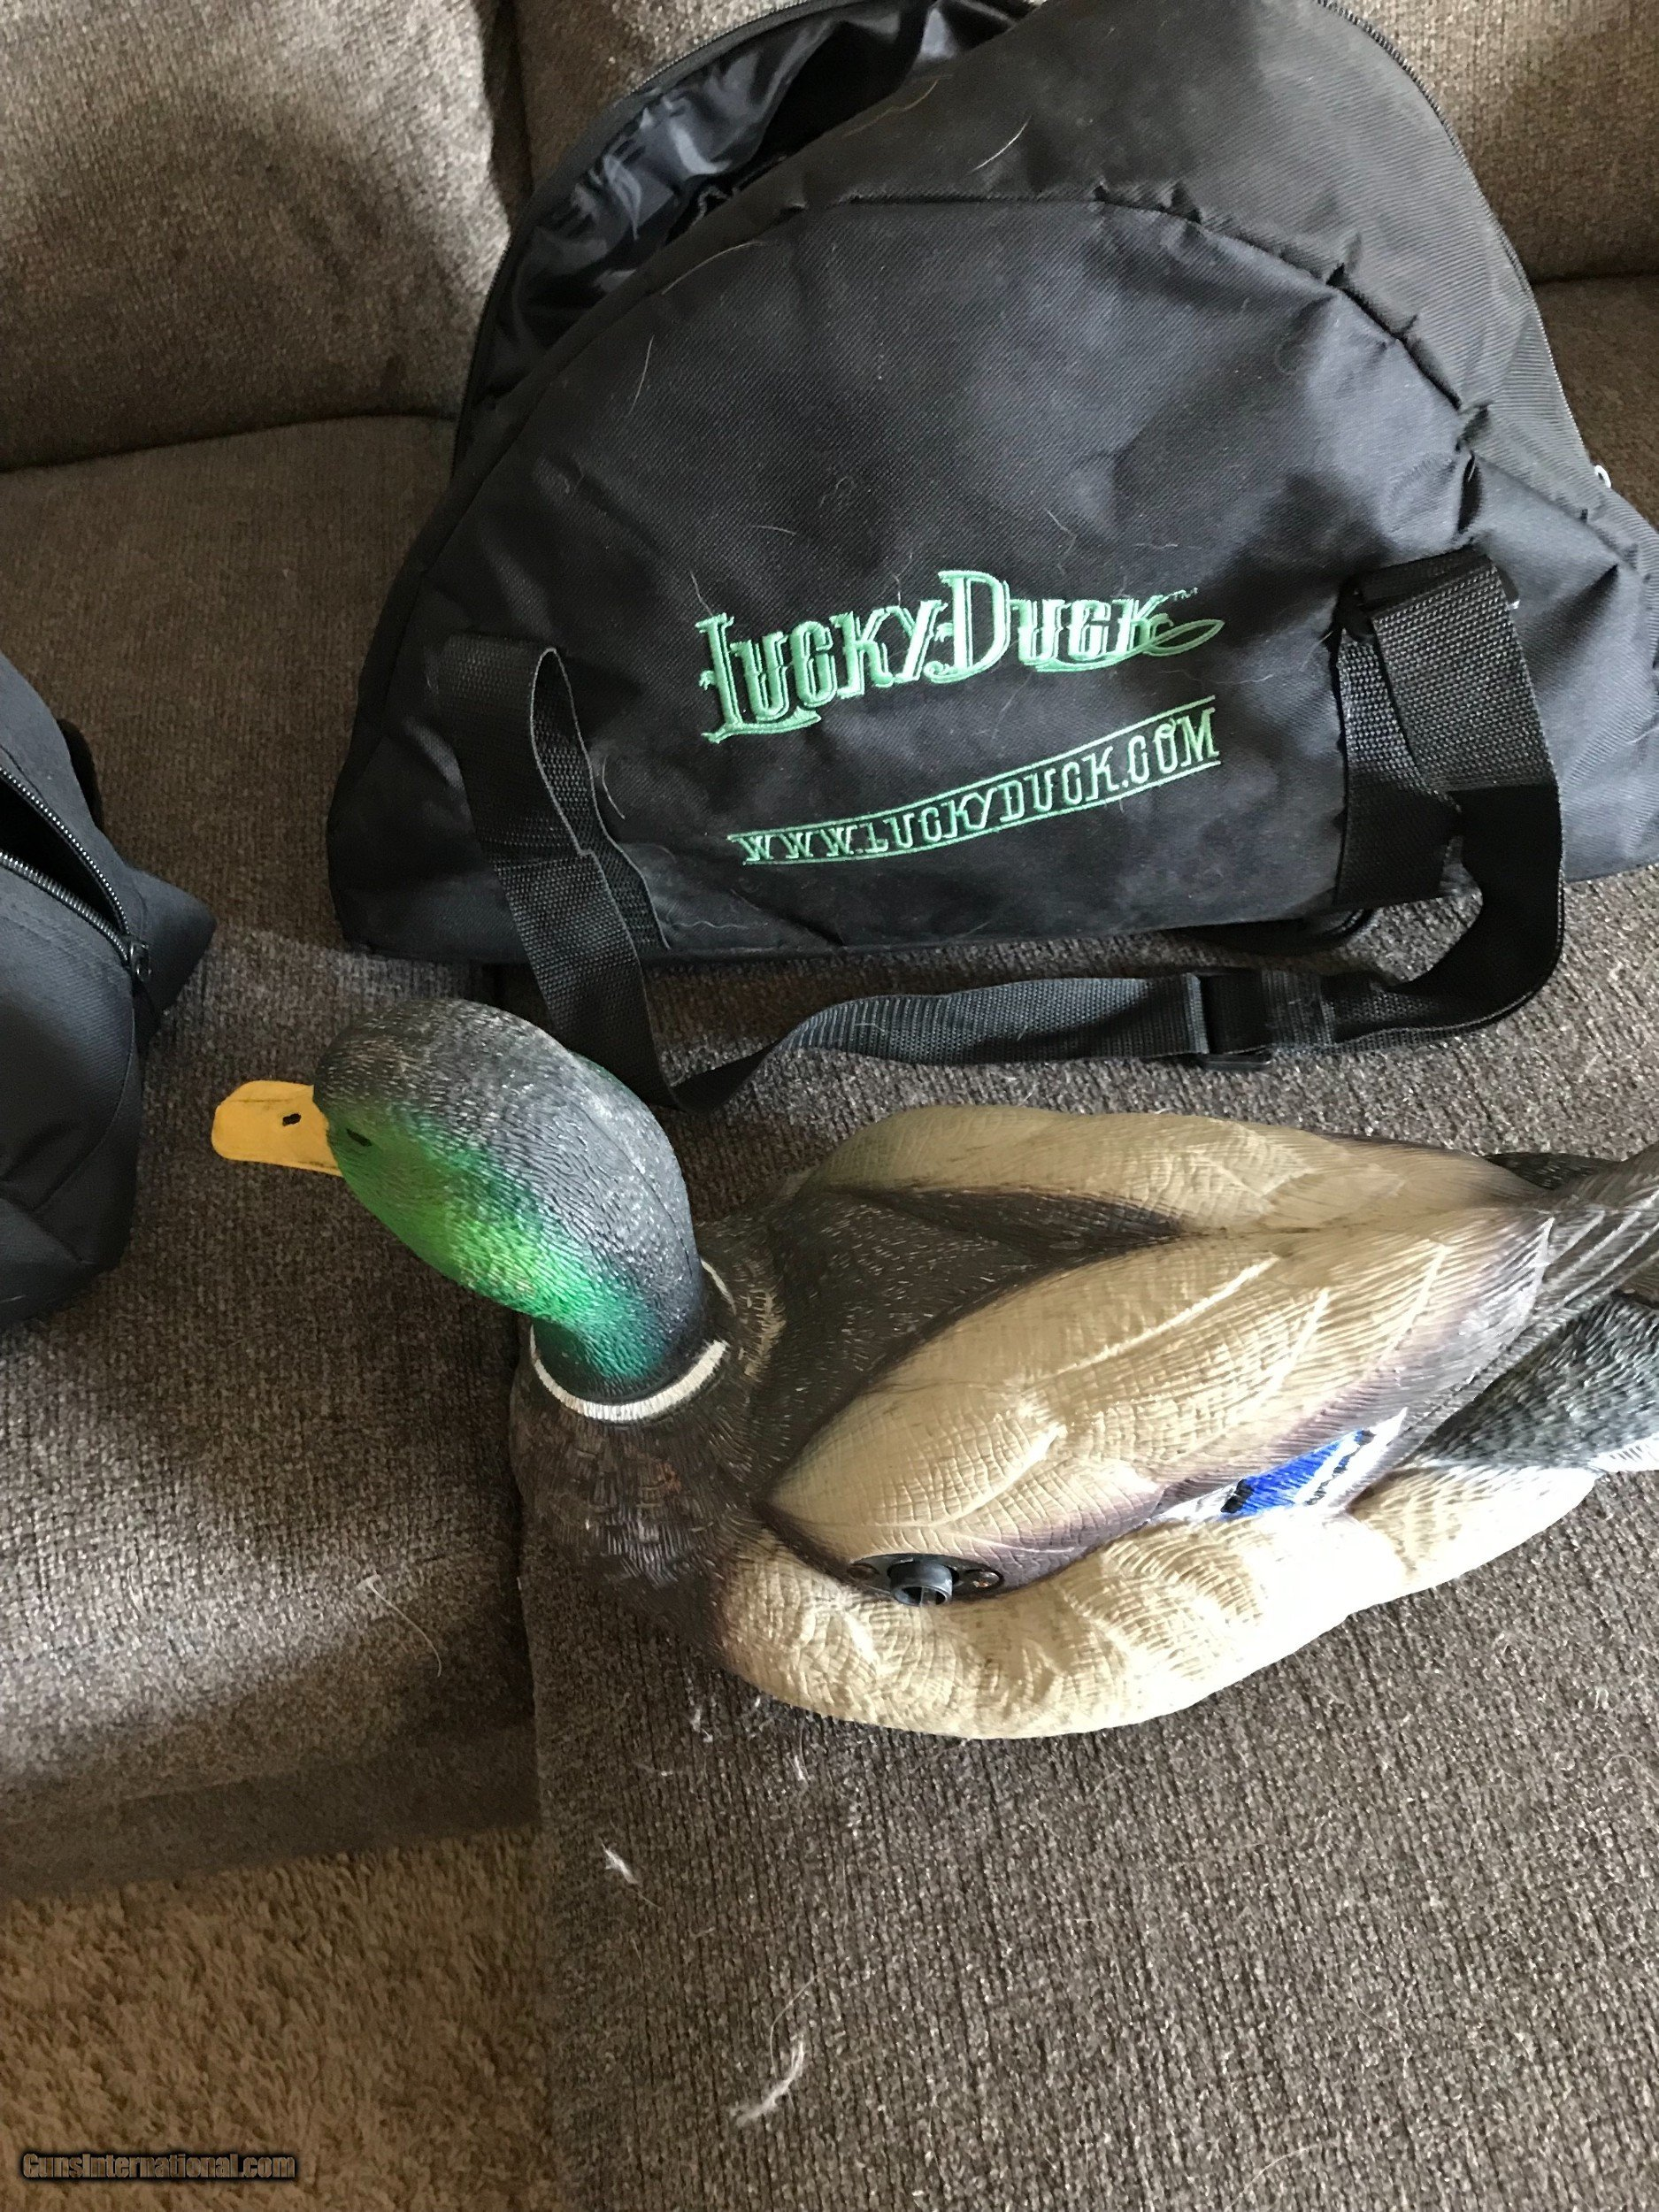 Lucky Duck Battery Operated Decoys Muskrat Hut Tube